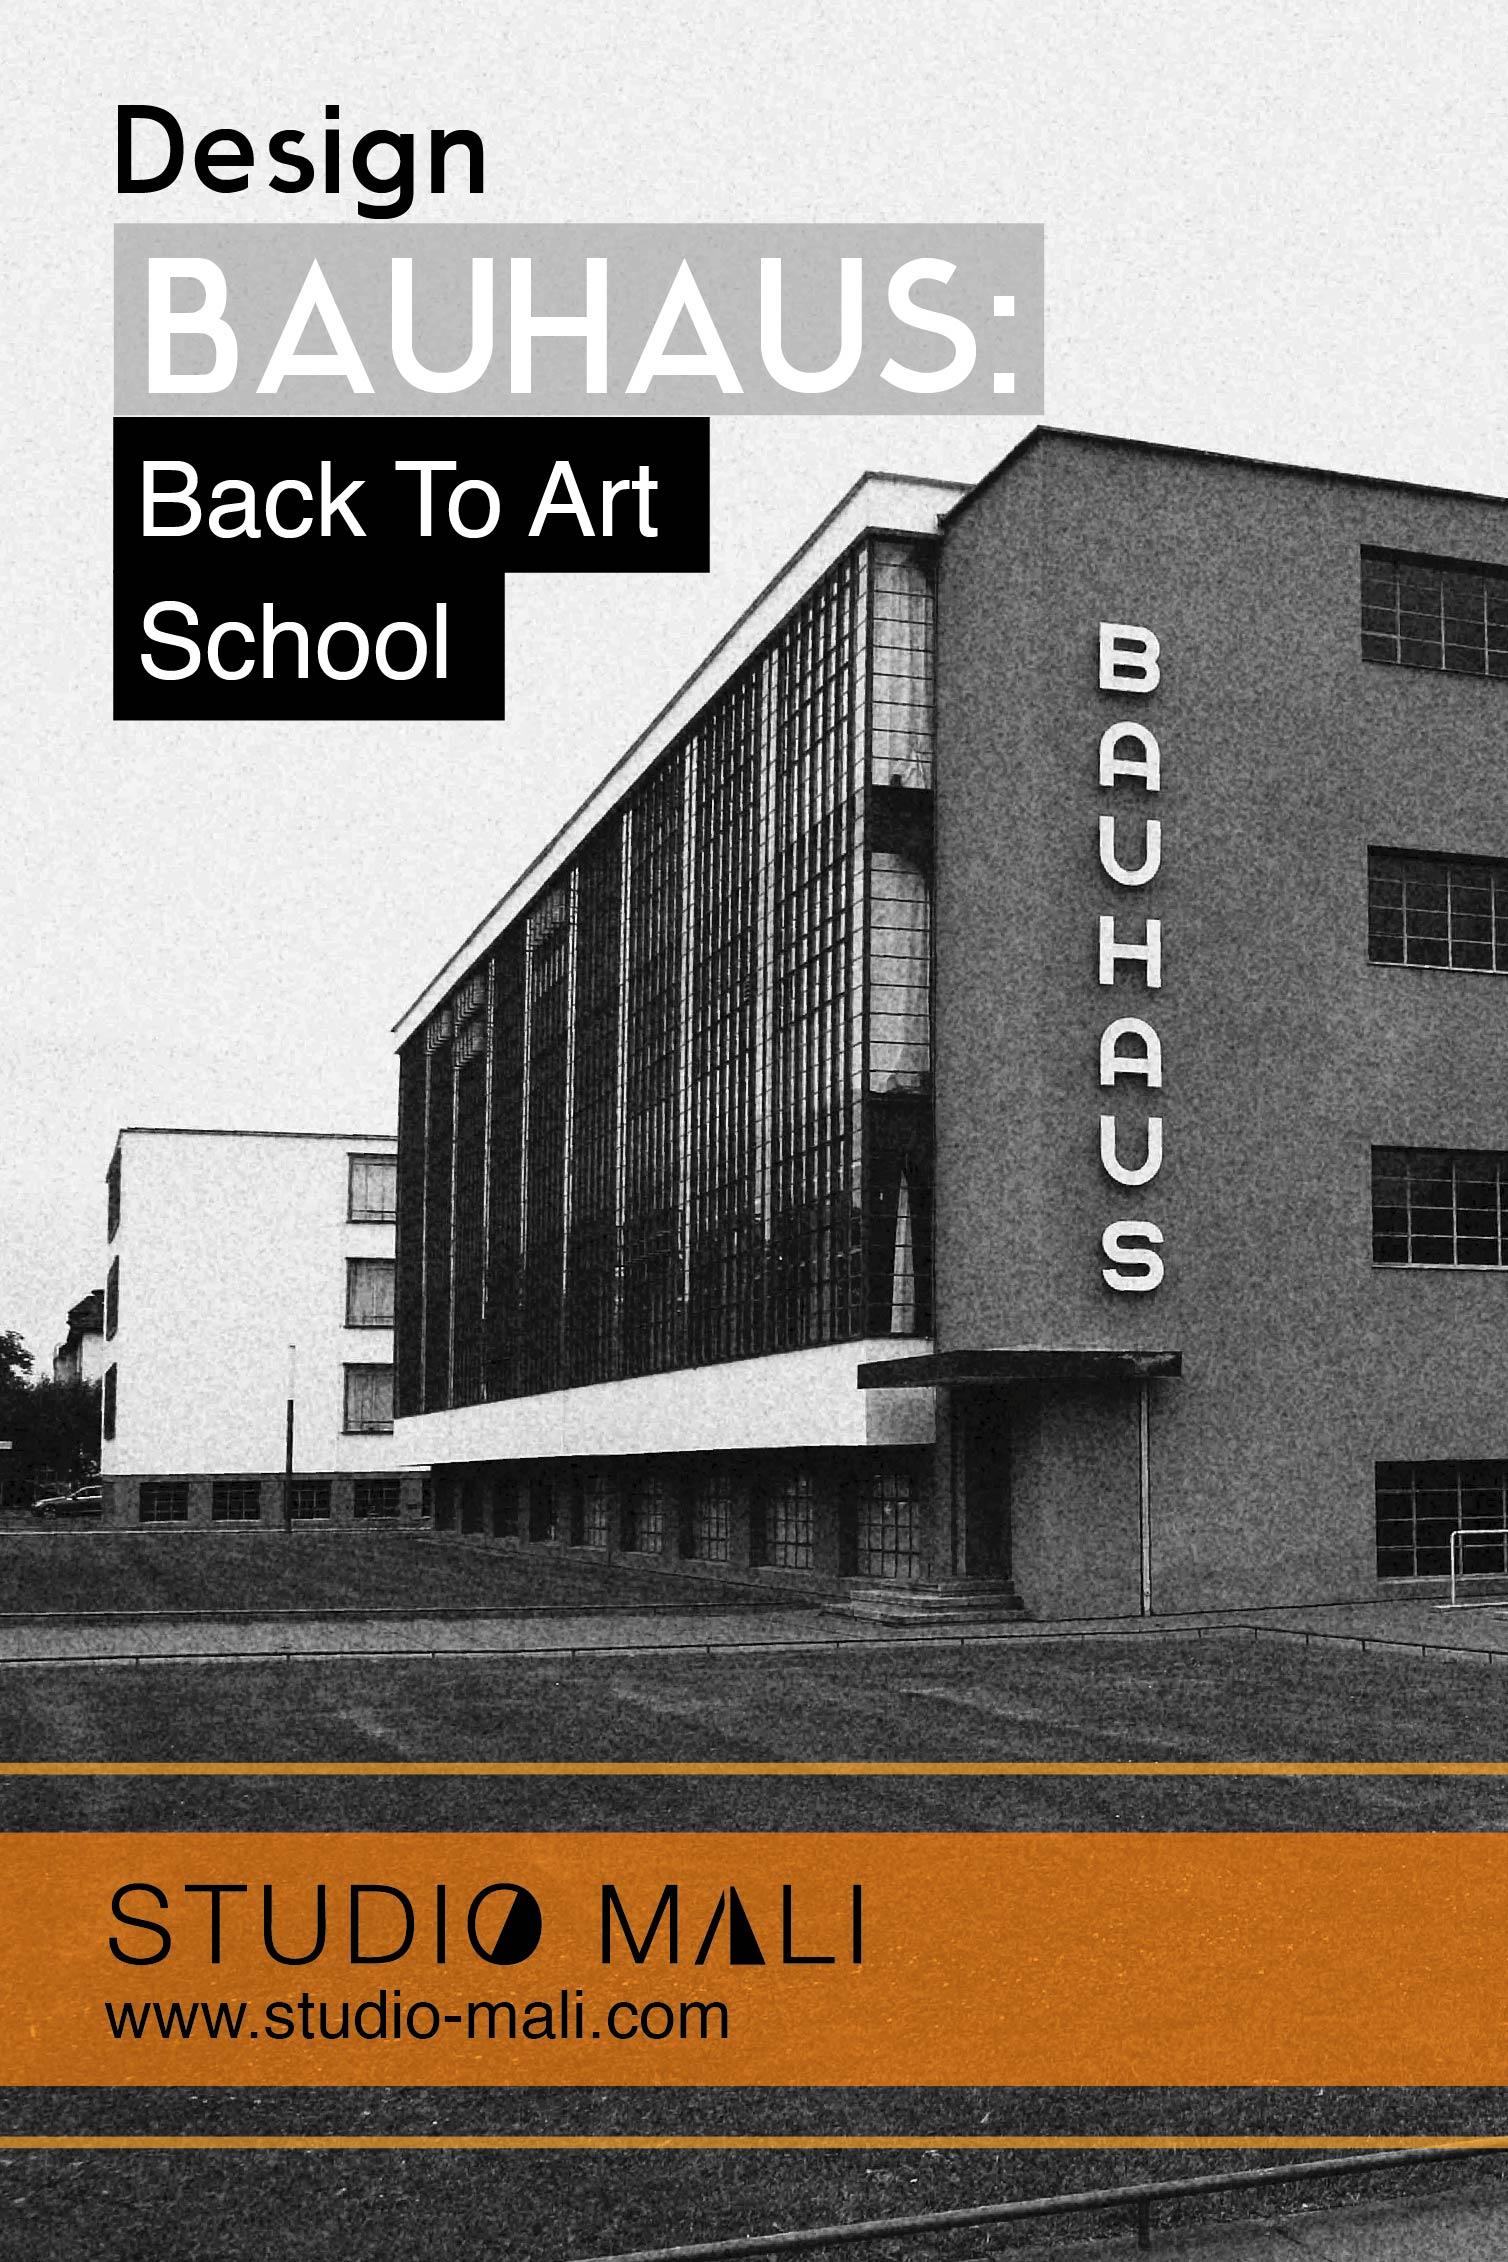 Bauhaus: Back To Art School